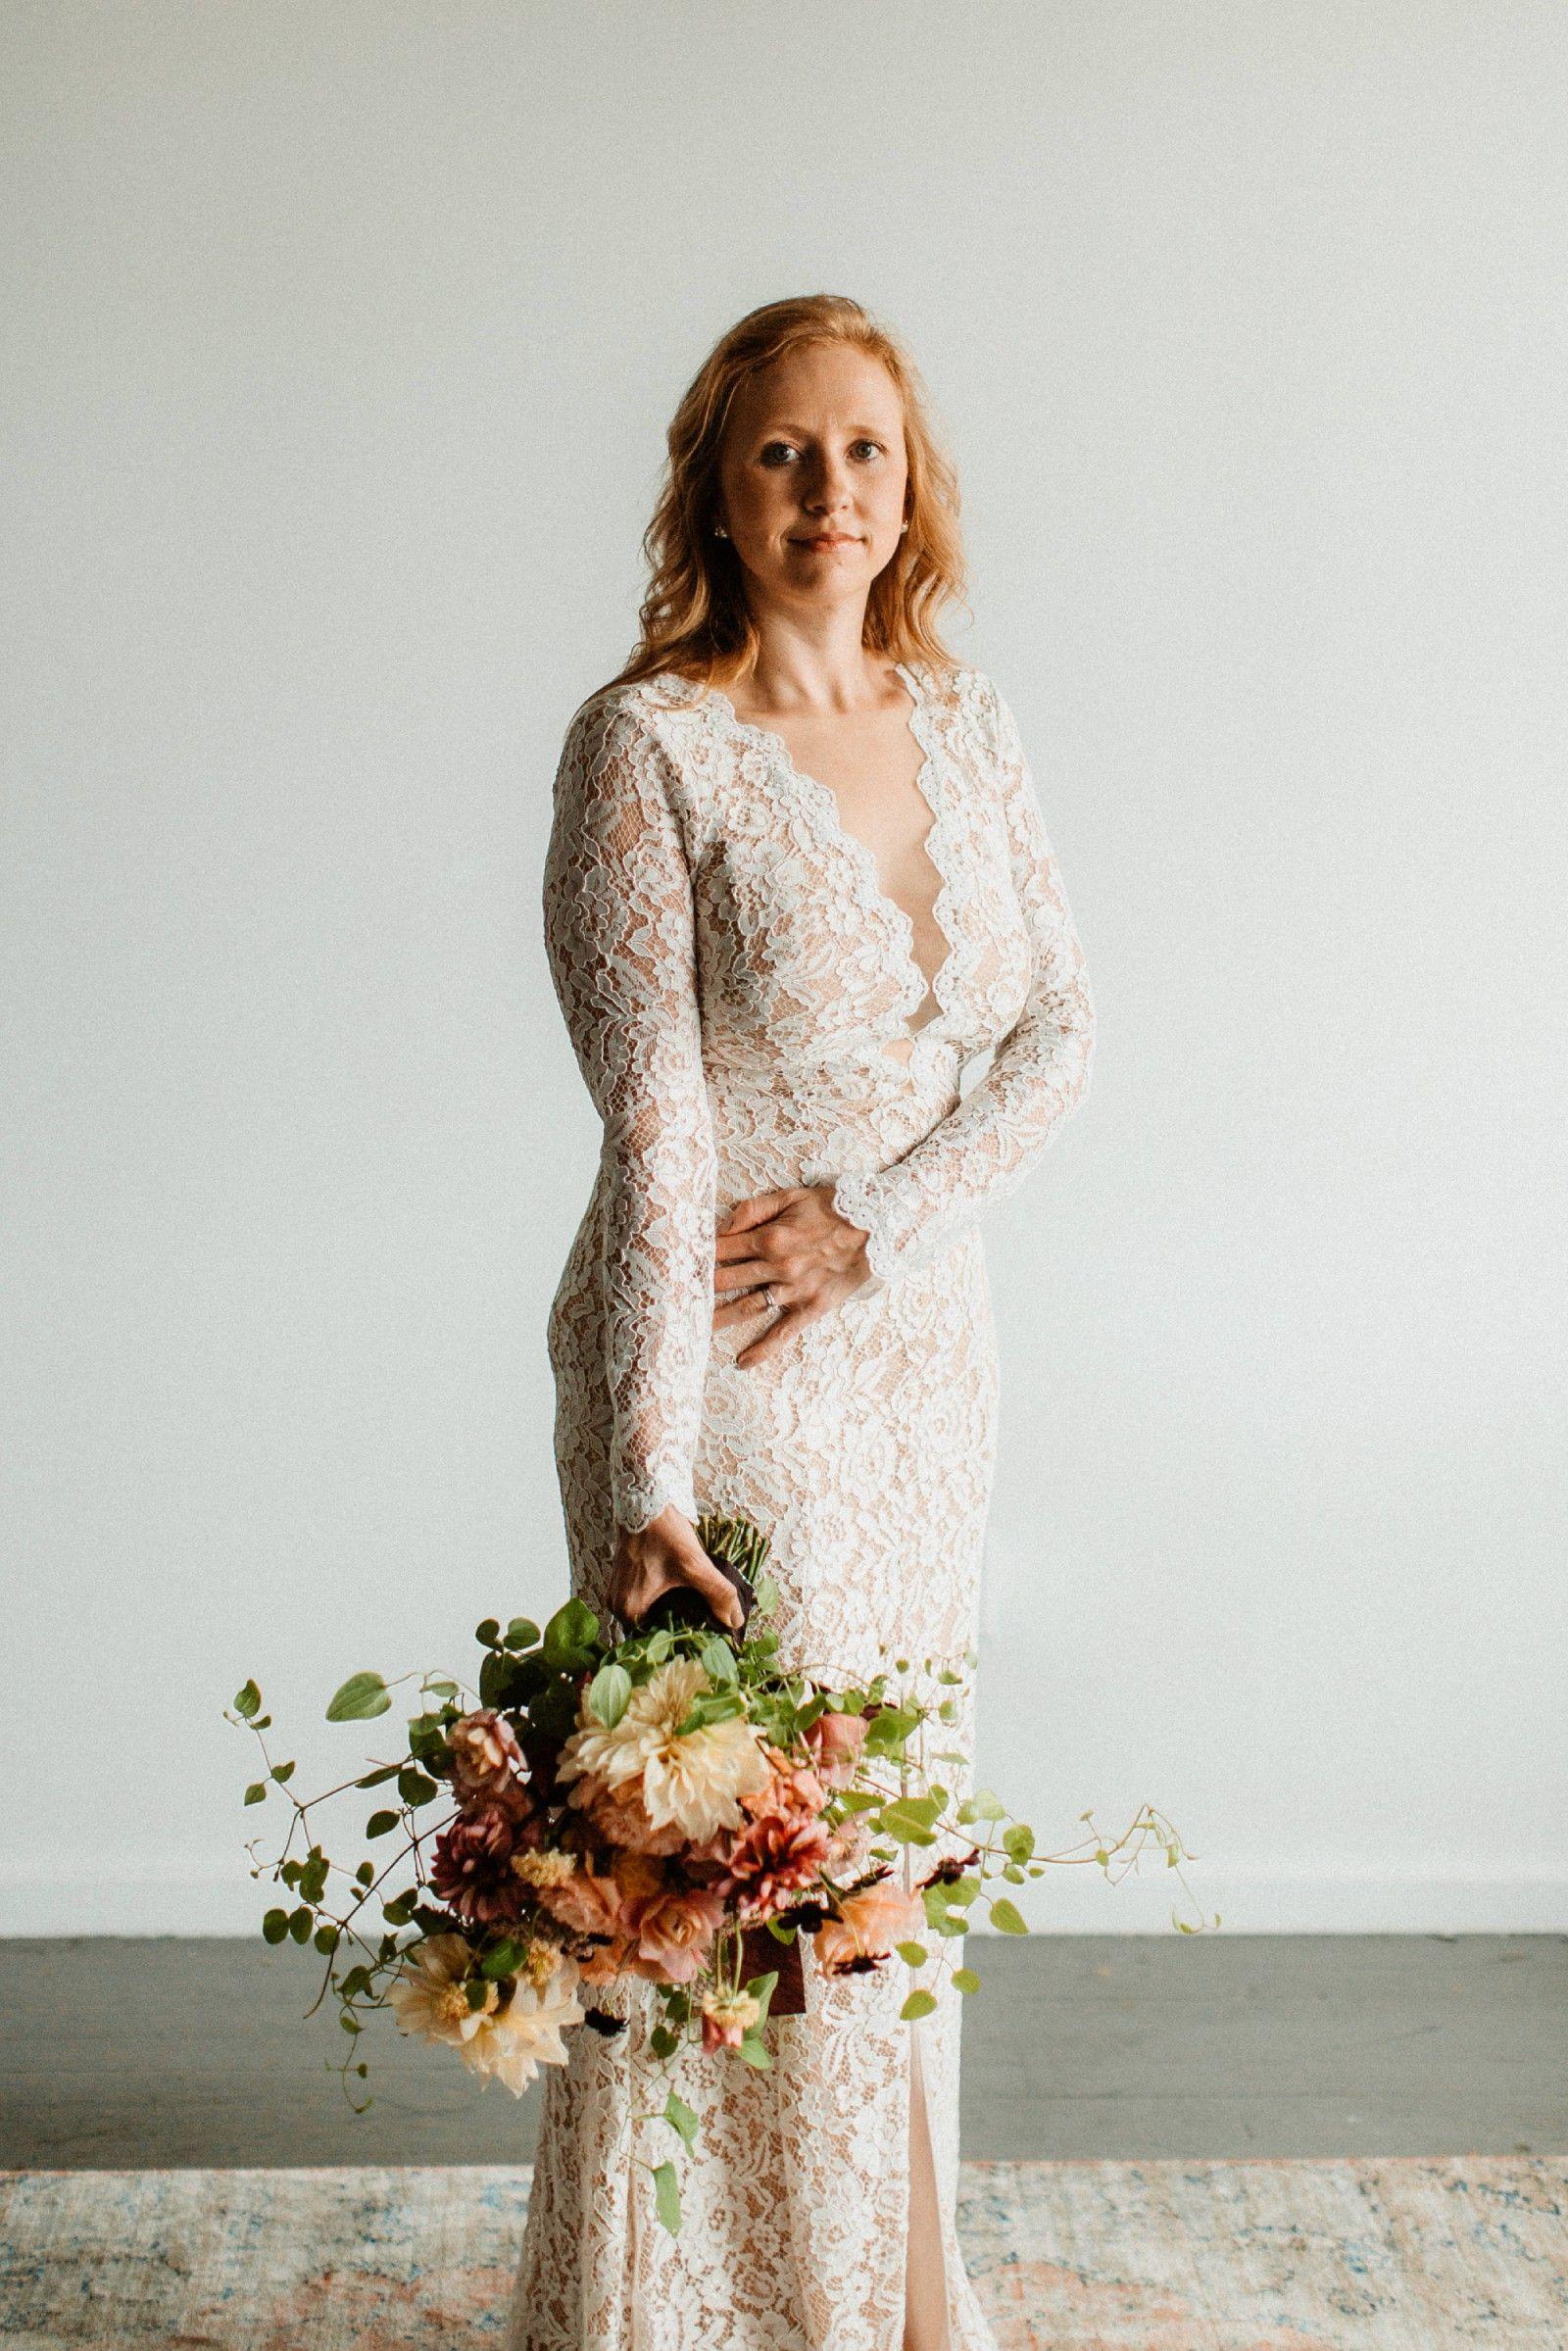 Tadashi Shoji Miraval Gown Used Wedding Dress Save 50 Tadashi Shoji Wedding Dress Used Wedding Dresses Wedding Dresses [ 2399 x 1600 Pixel ]